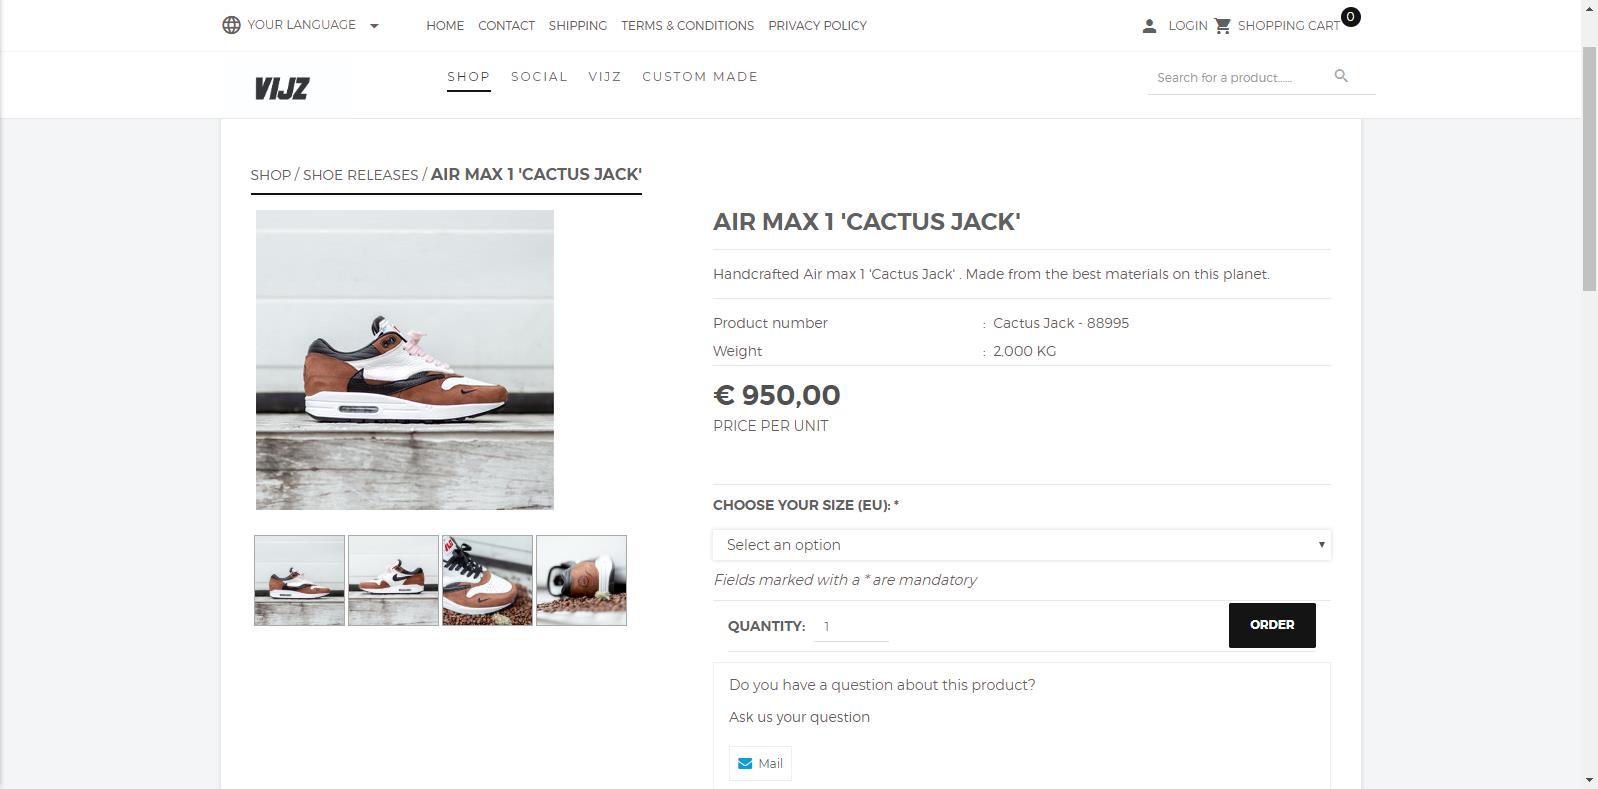 vijzbespokes,Nike,Air Max 1,AF 30 多种材质拼接而成!这双 Air Max 1 堪称顶级设计!